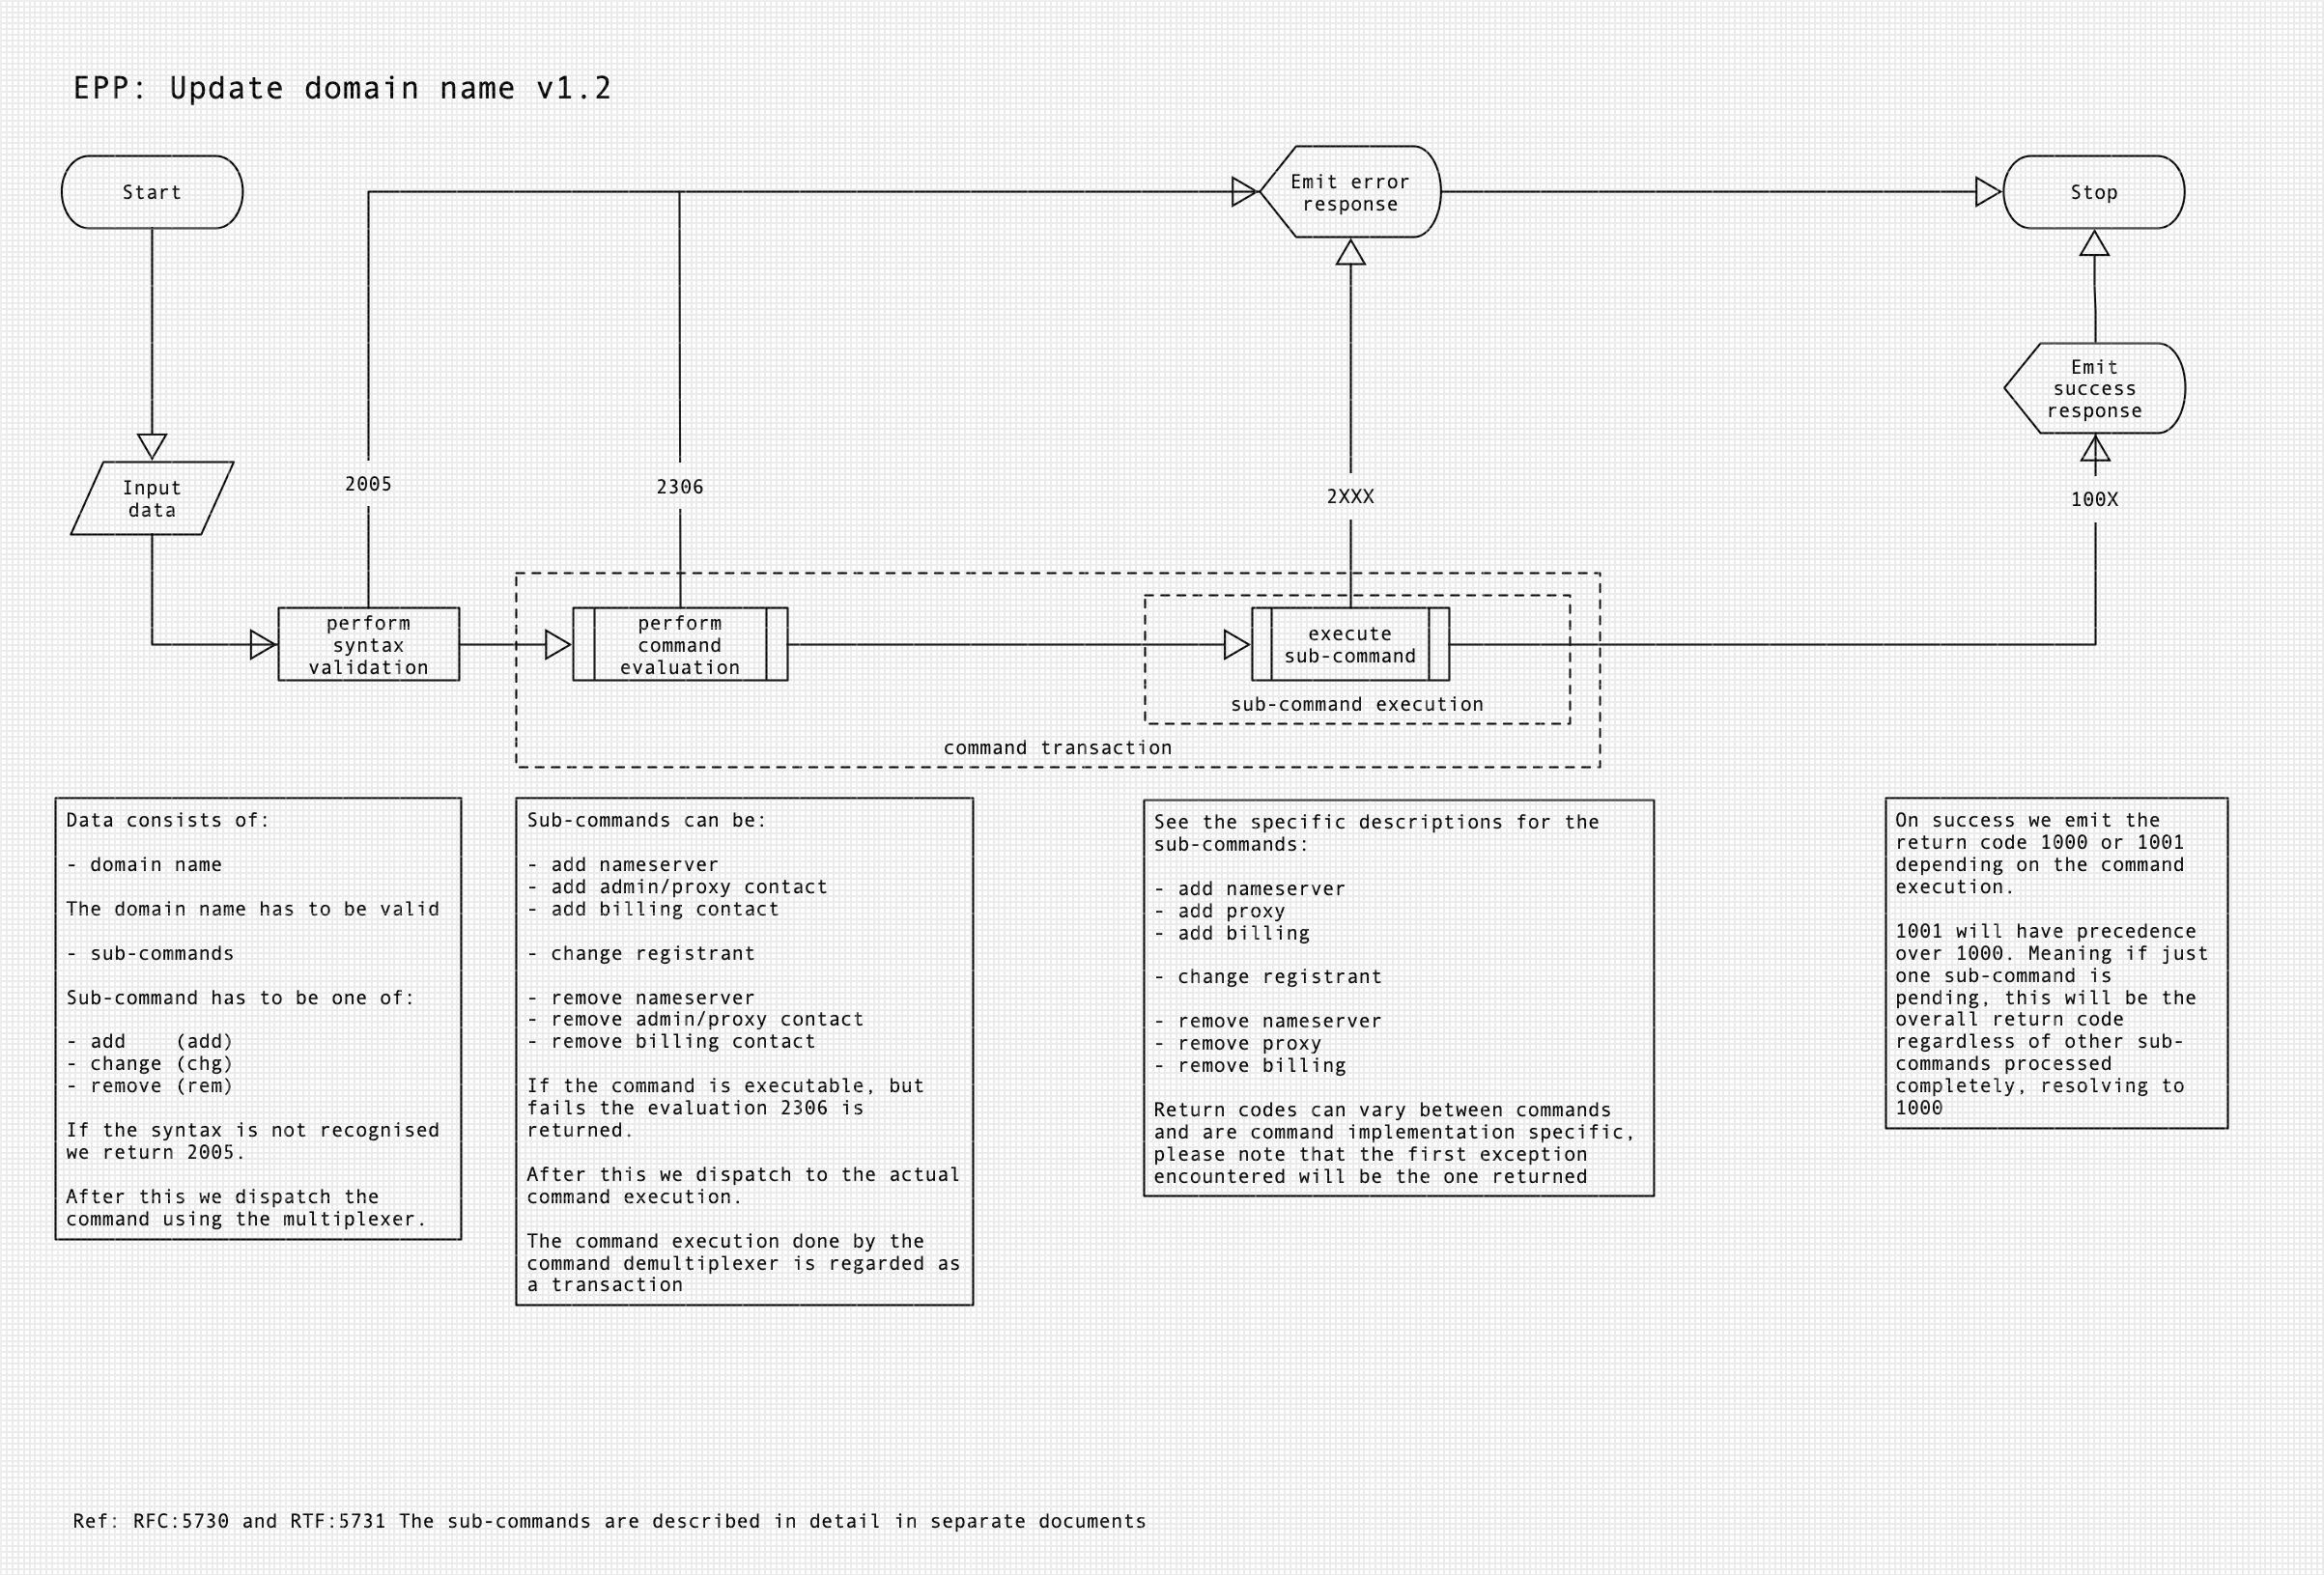 Diagram of EPP process for EPP update domain